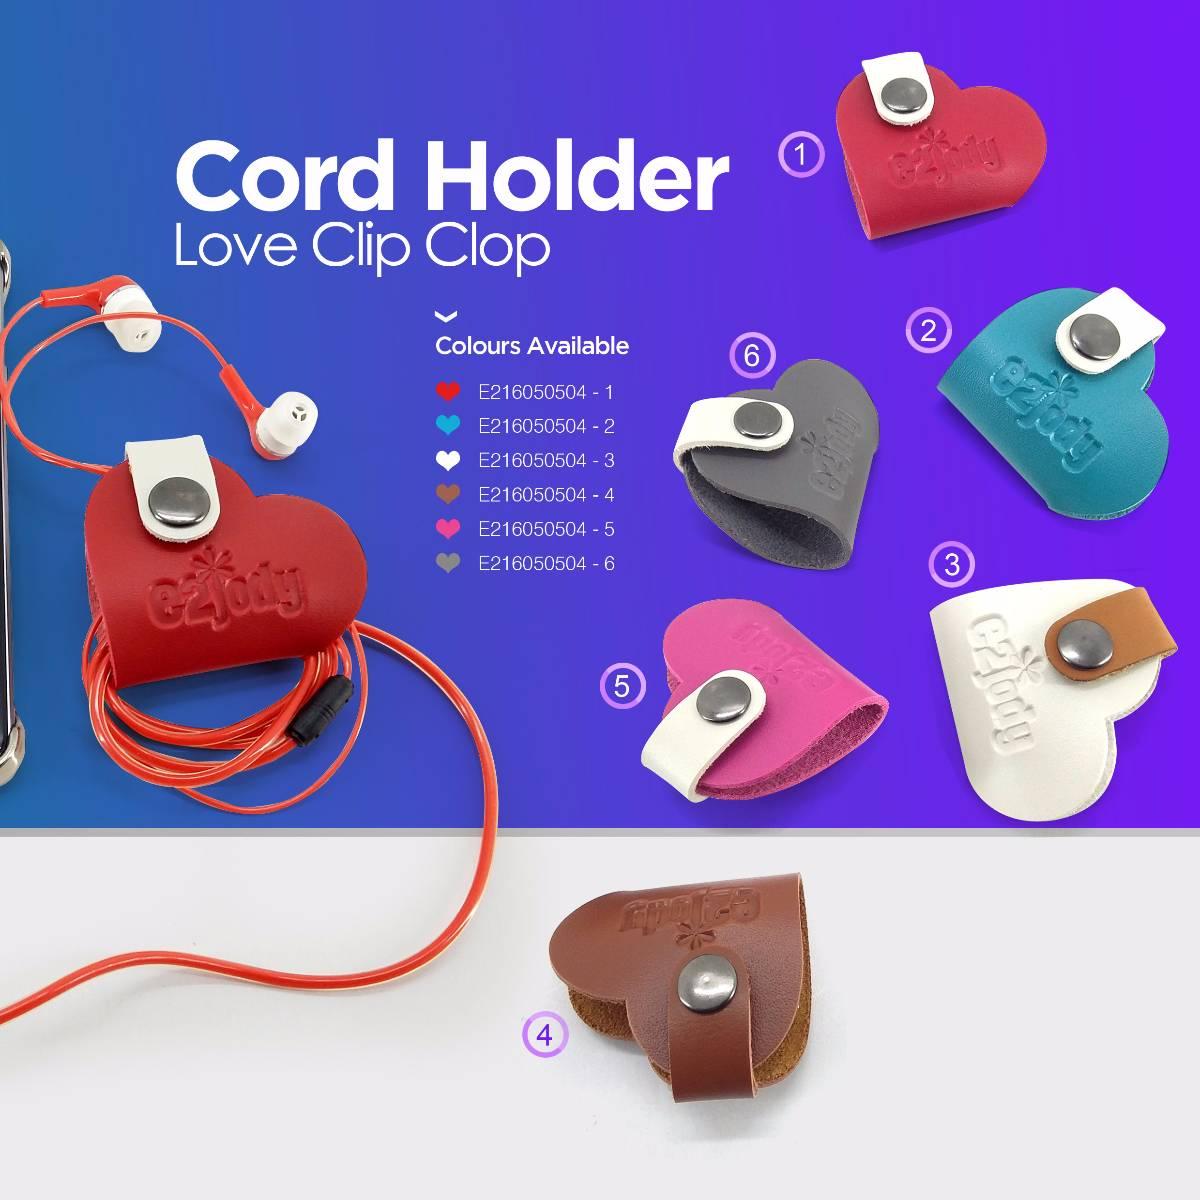 Cord Holder Love